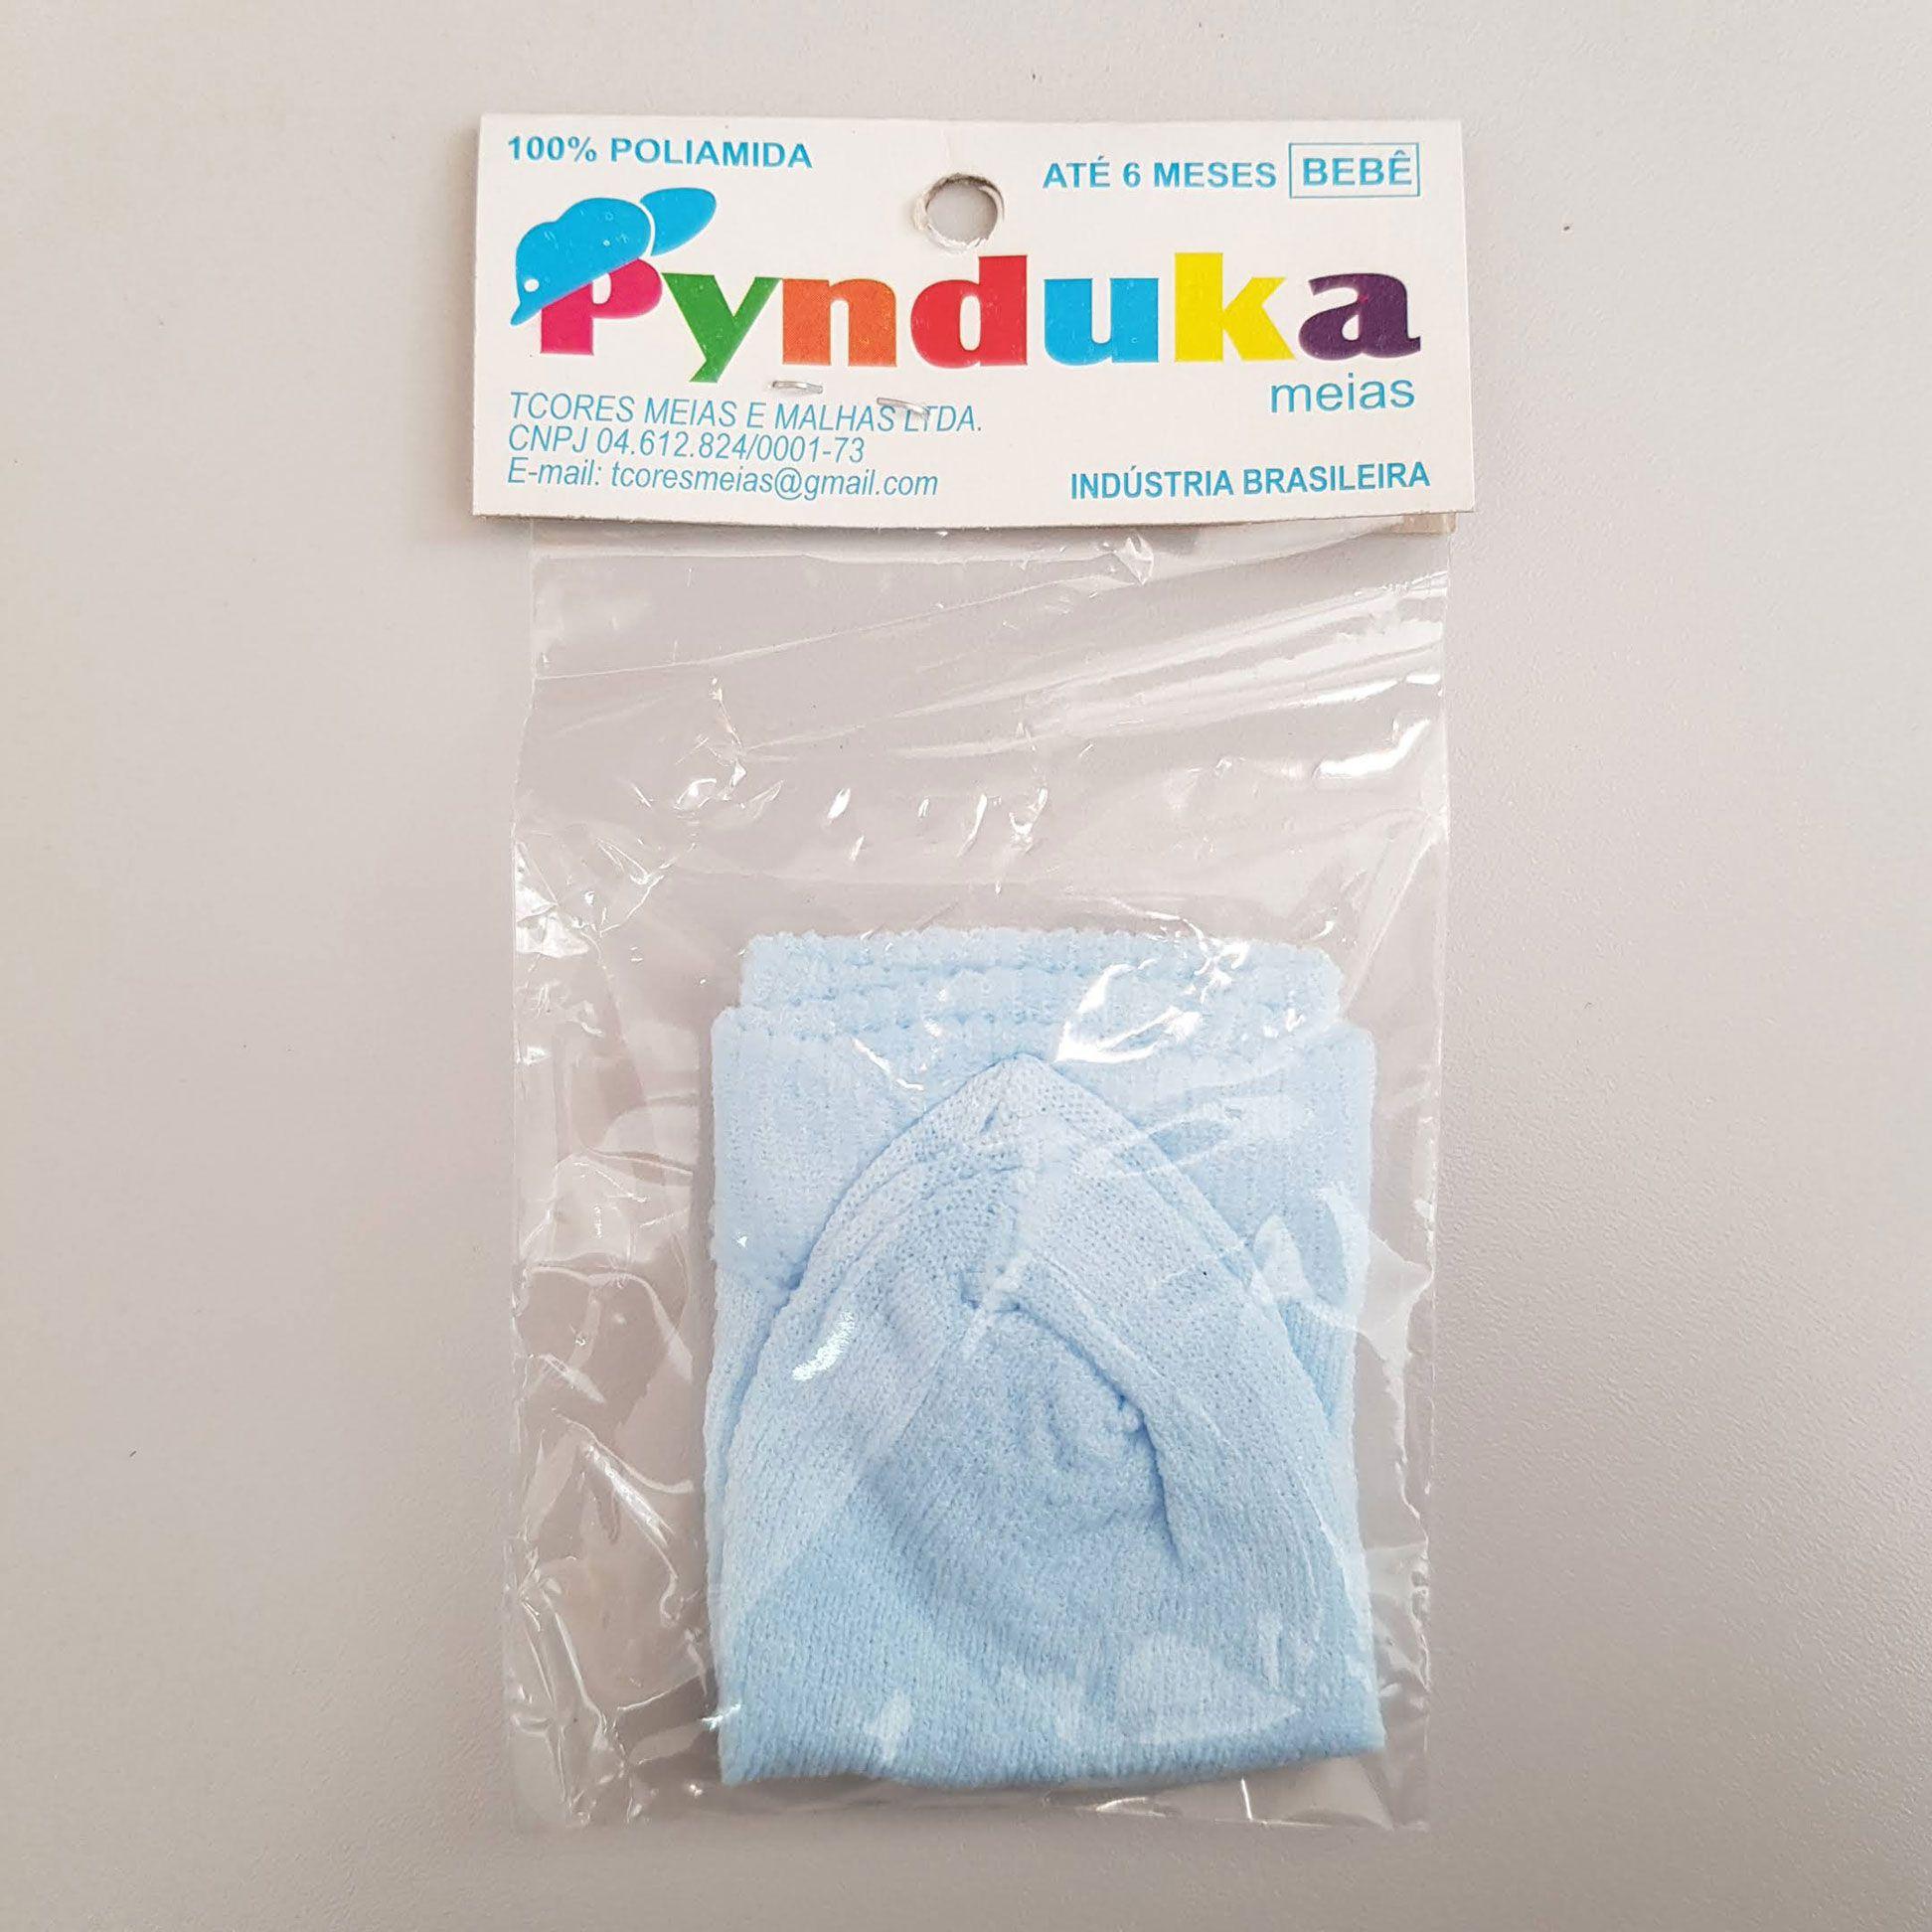 Meia Infantil 0-6 meses 1 par Azul - Pynduka